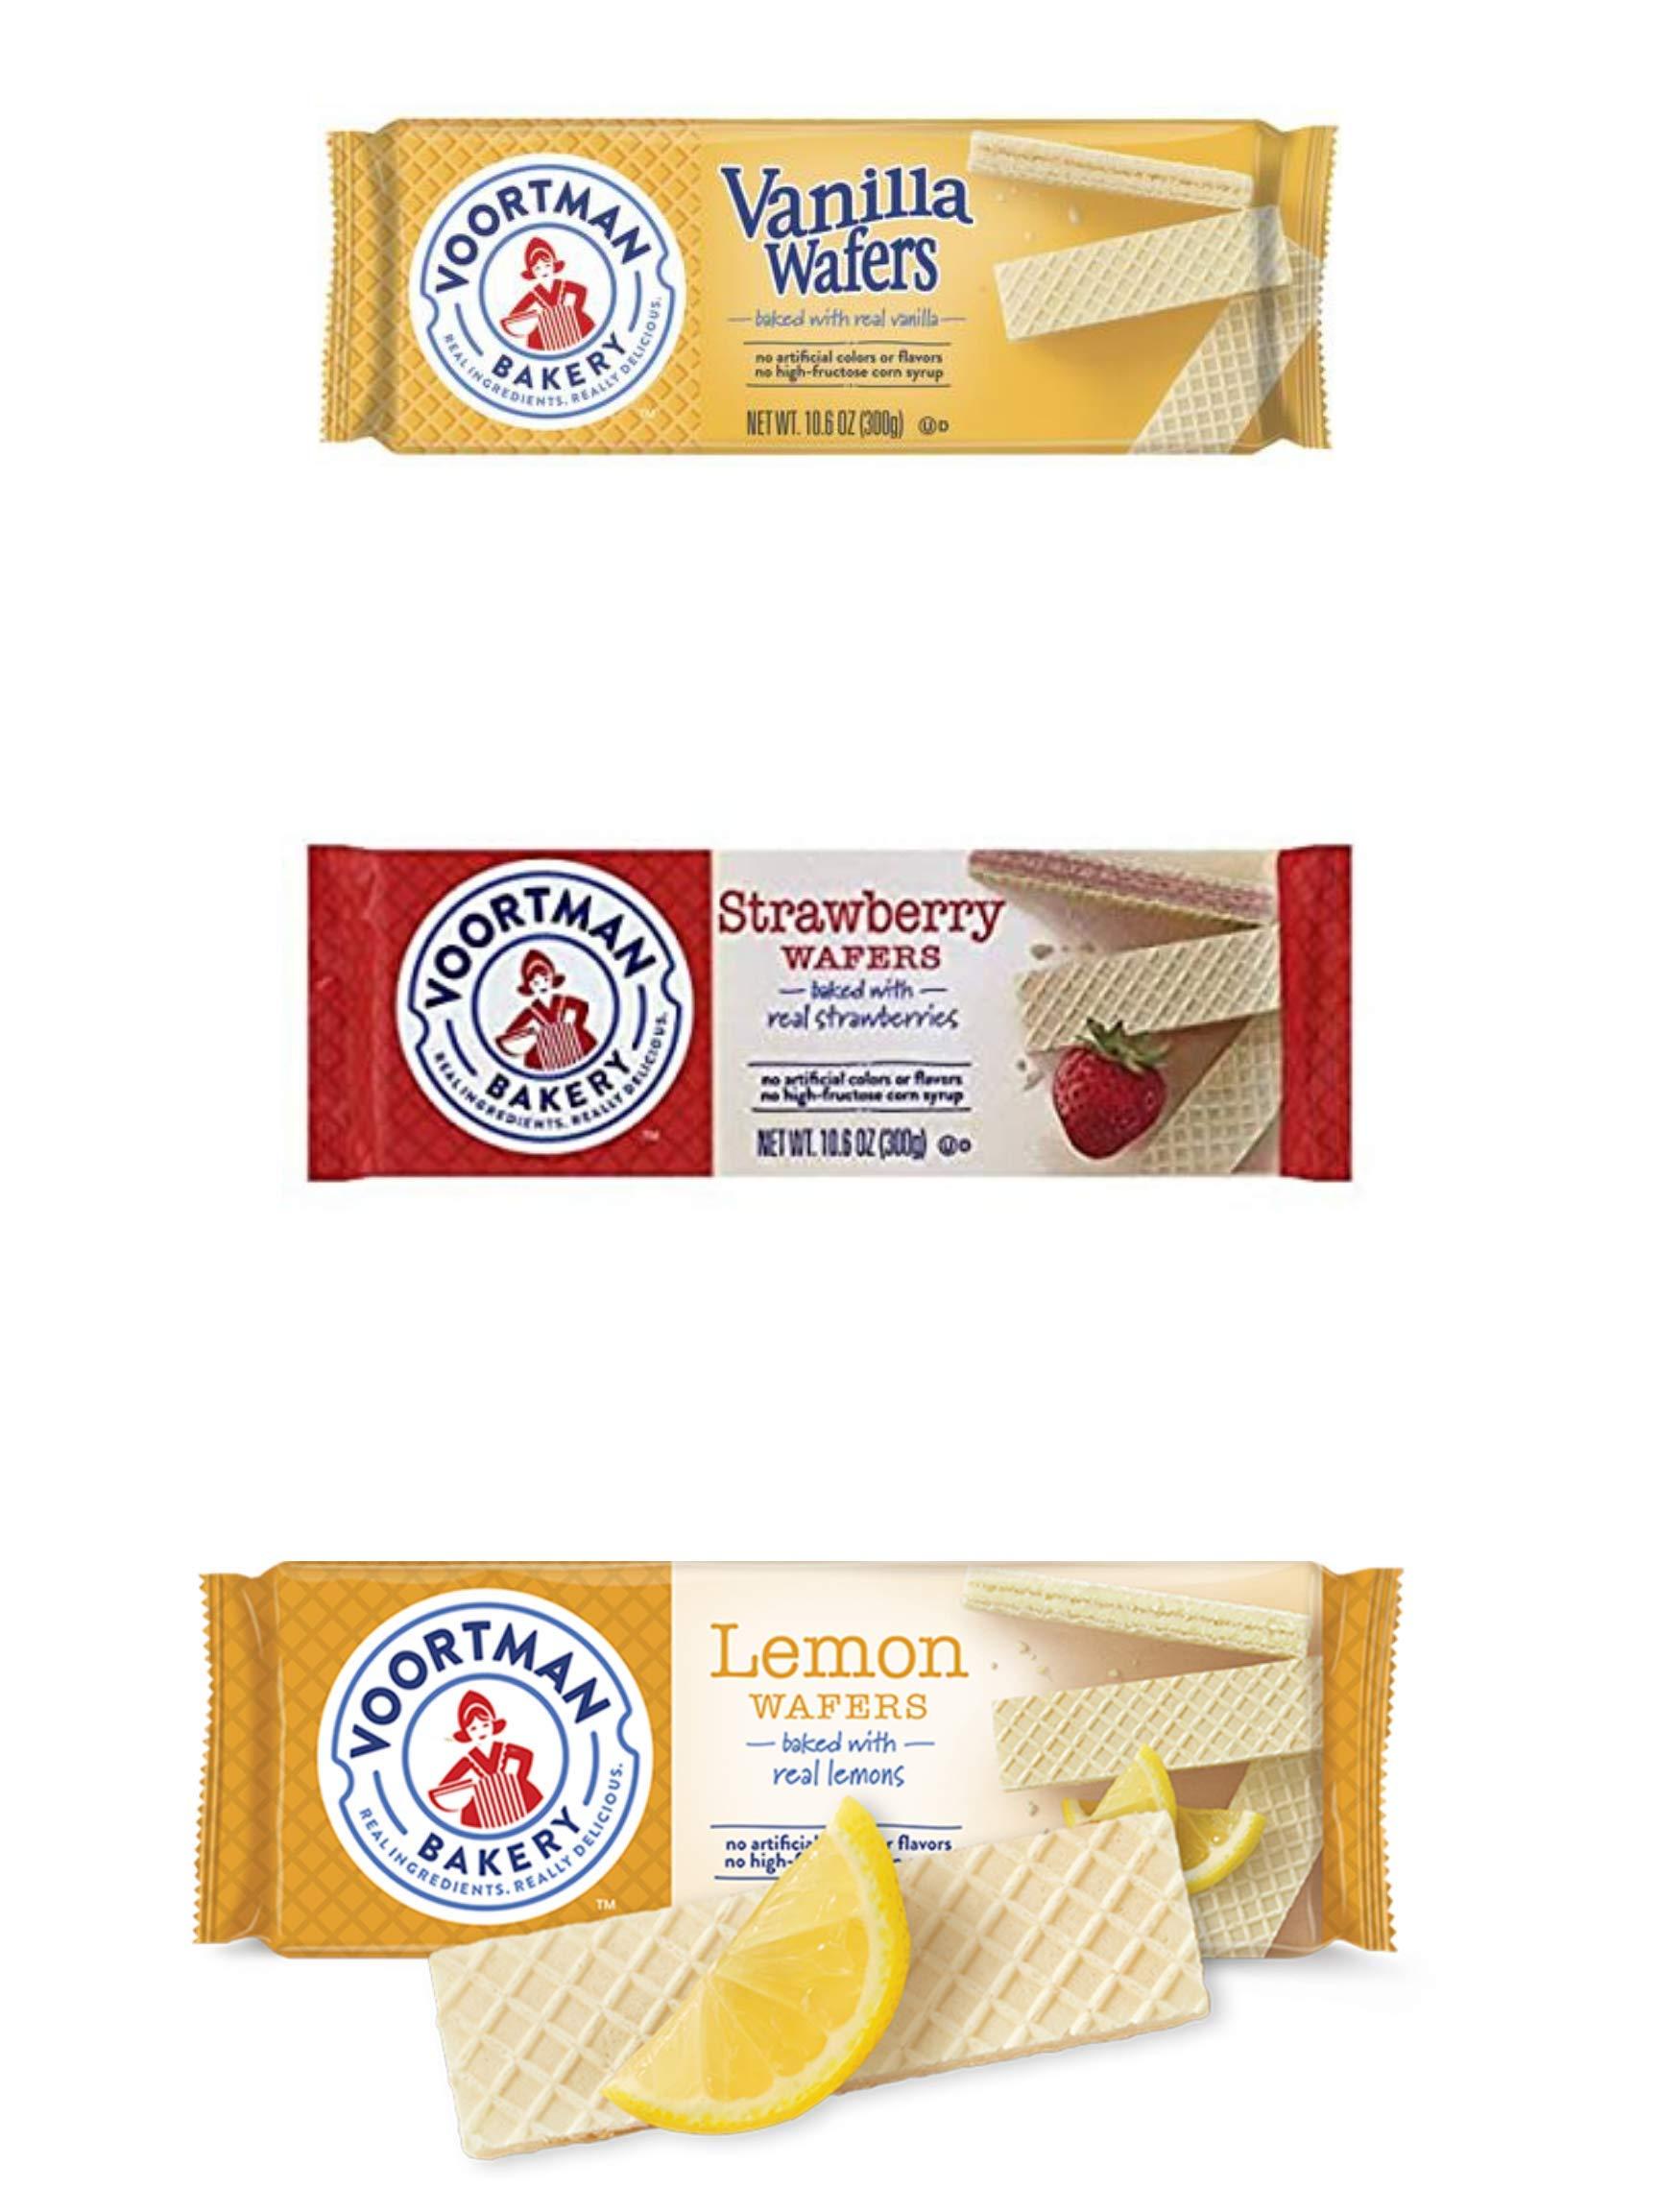 Voortman Wafers Cookies | Vanilla Wafers 14.1 Oz | Lemon Wafers 10.6 Oz | Strawberry Wafers 10.6 Oz - BUNDLE 3